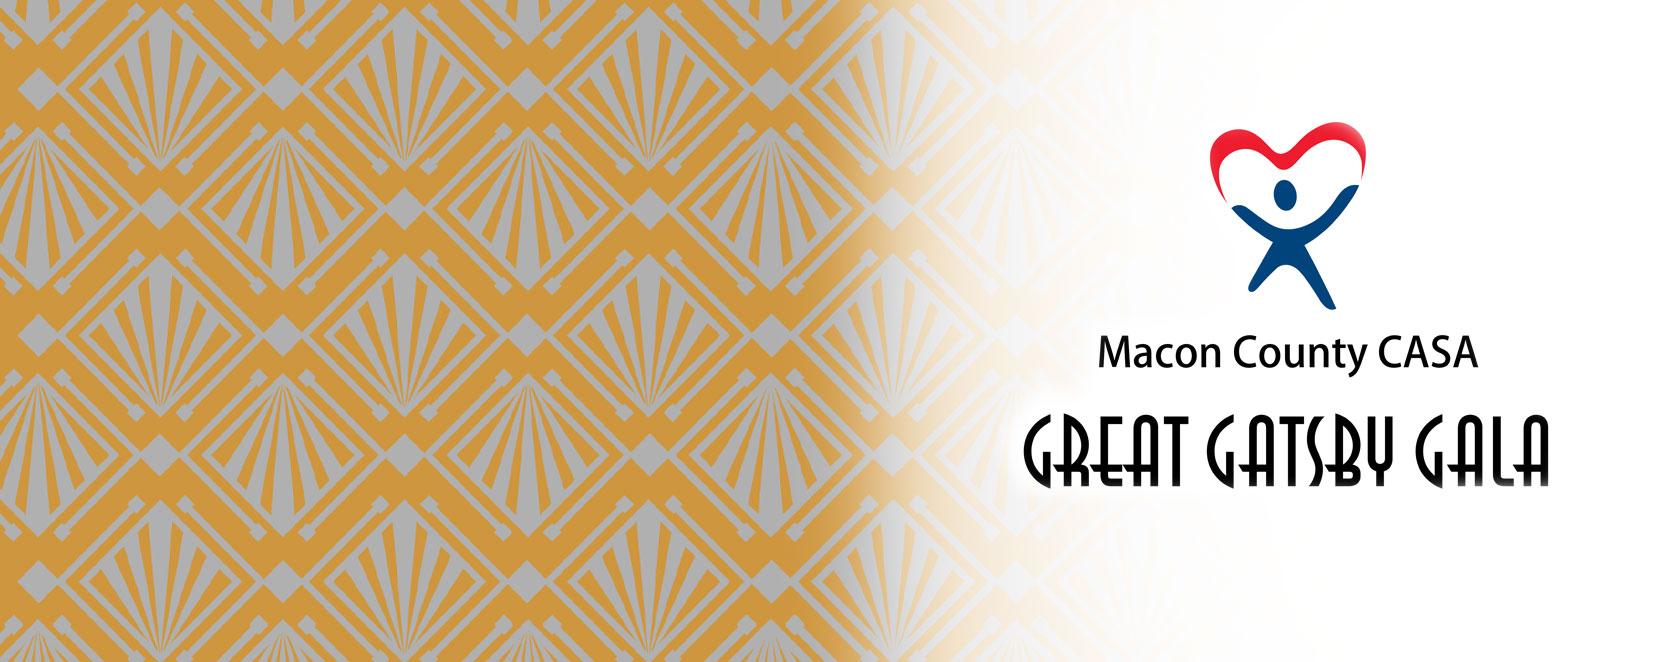 Great Gatsby Gala, Saturday, October 16